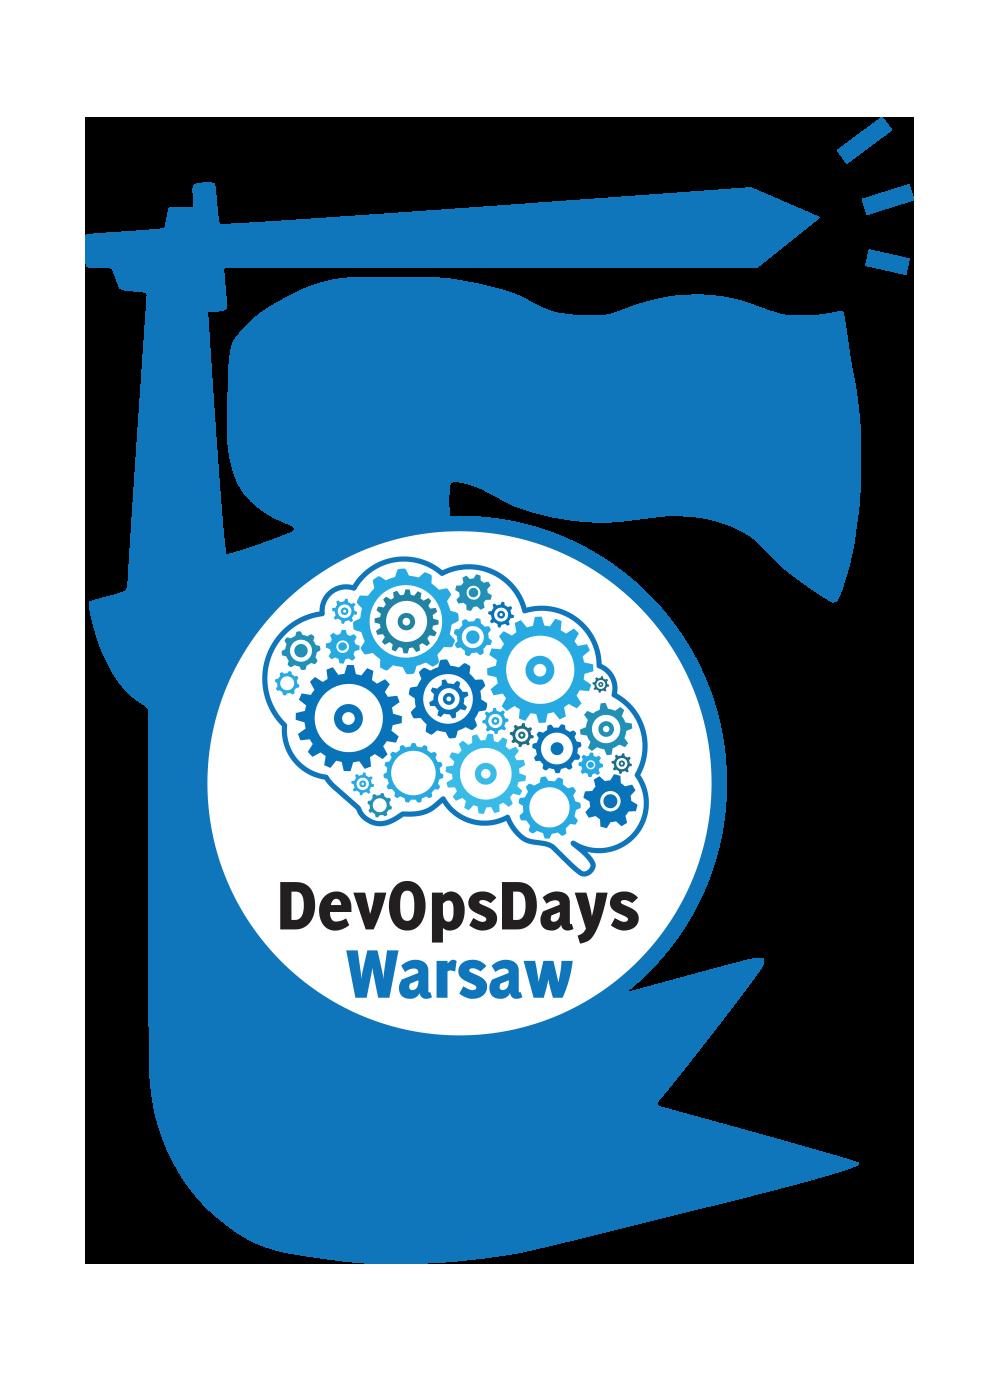 devopsdays Warsaw 2017